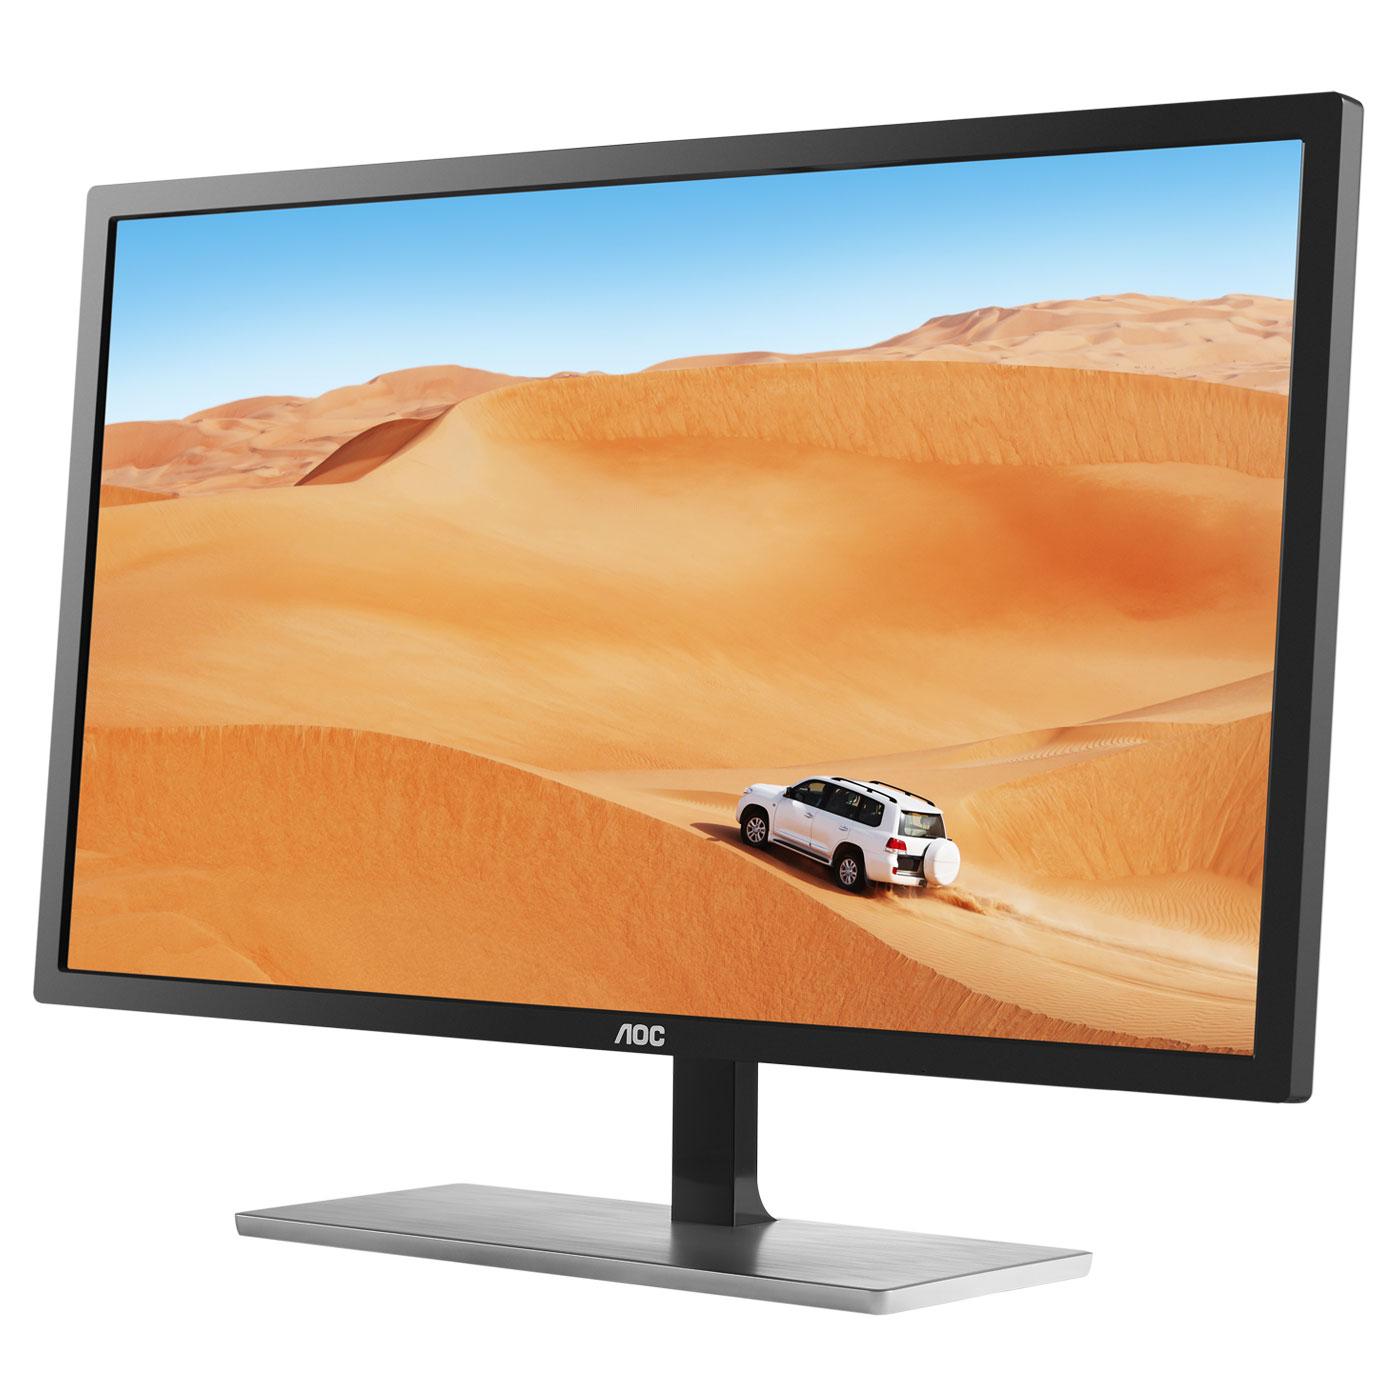 "Écran PC 31.5"" AOC Q3279VWF - Dalle MVA, 2560 × 1440, Freesync, 5 ms (+ bon d'achat de 10€ via l'applicati"